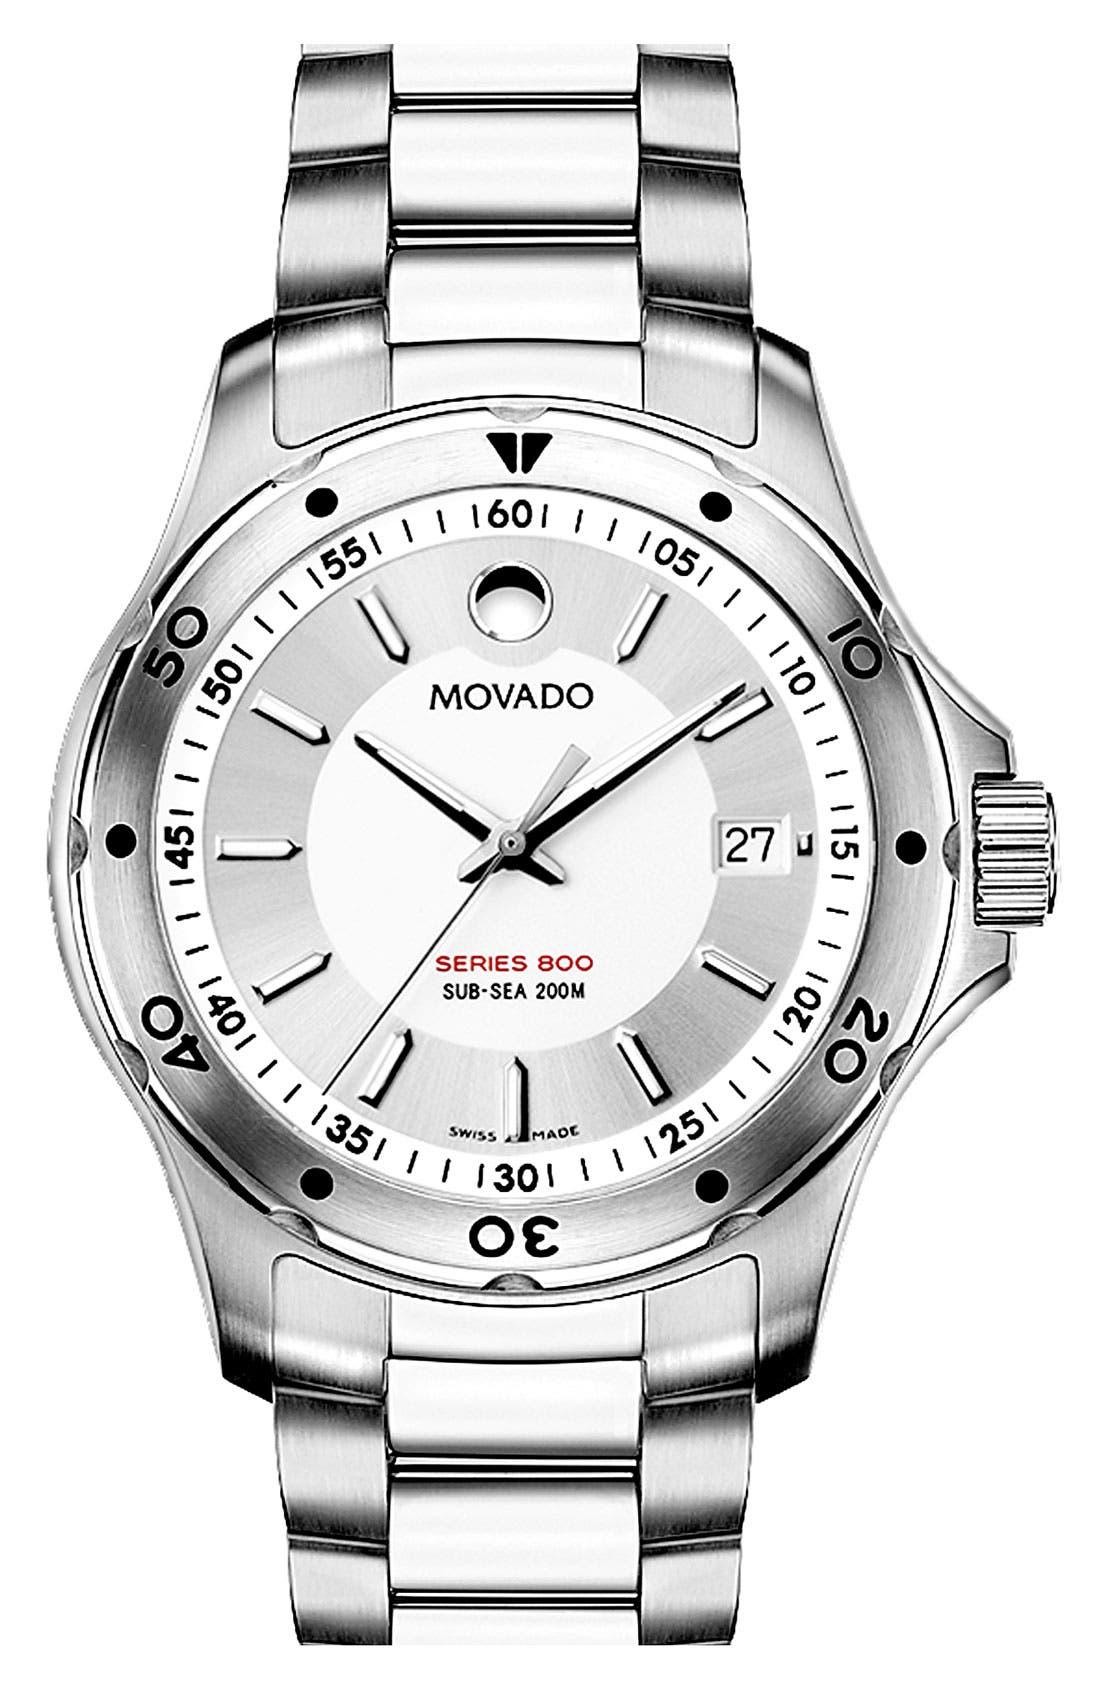 Alternate Image 1 Selected - Movado 'Series 800' Men's Stainless Steel Watch